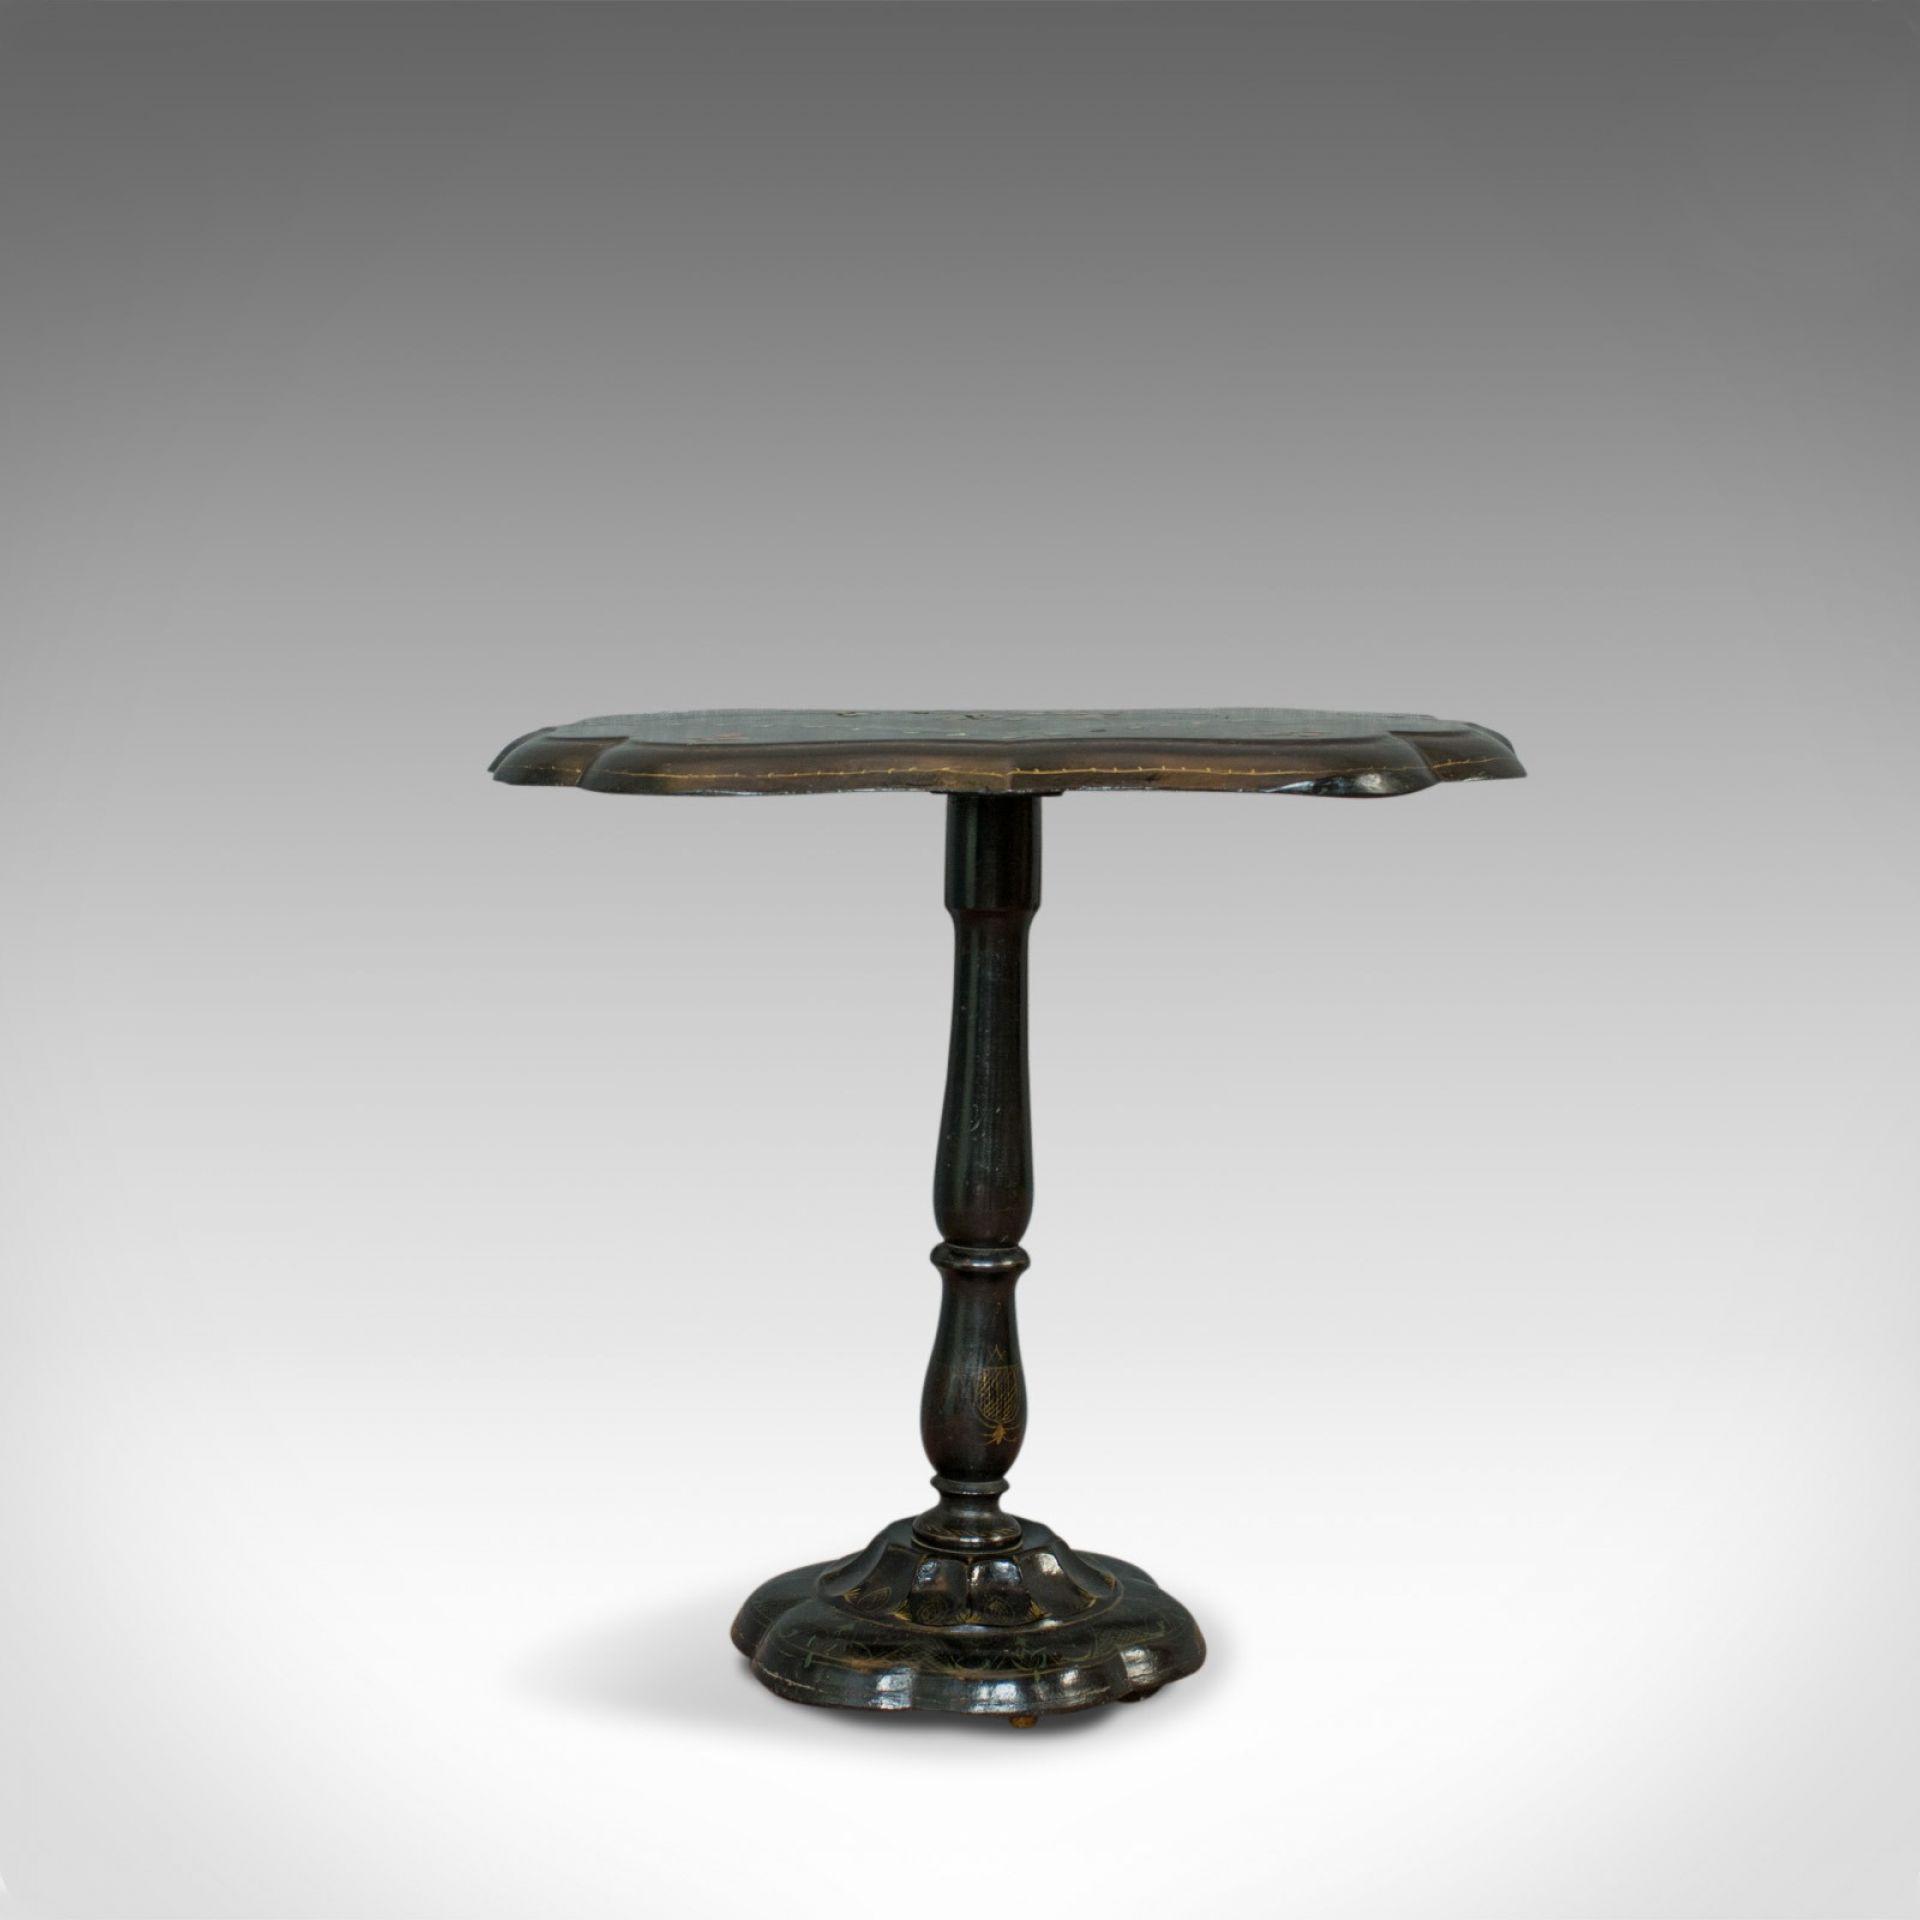 Antique Table, Ebonised, Papier Mache, Mother of Pearl, Side, Lamp, Wine, Tilt